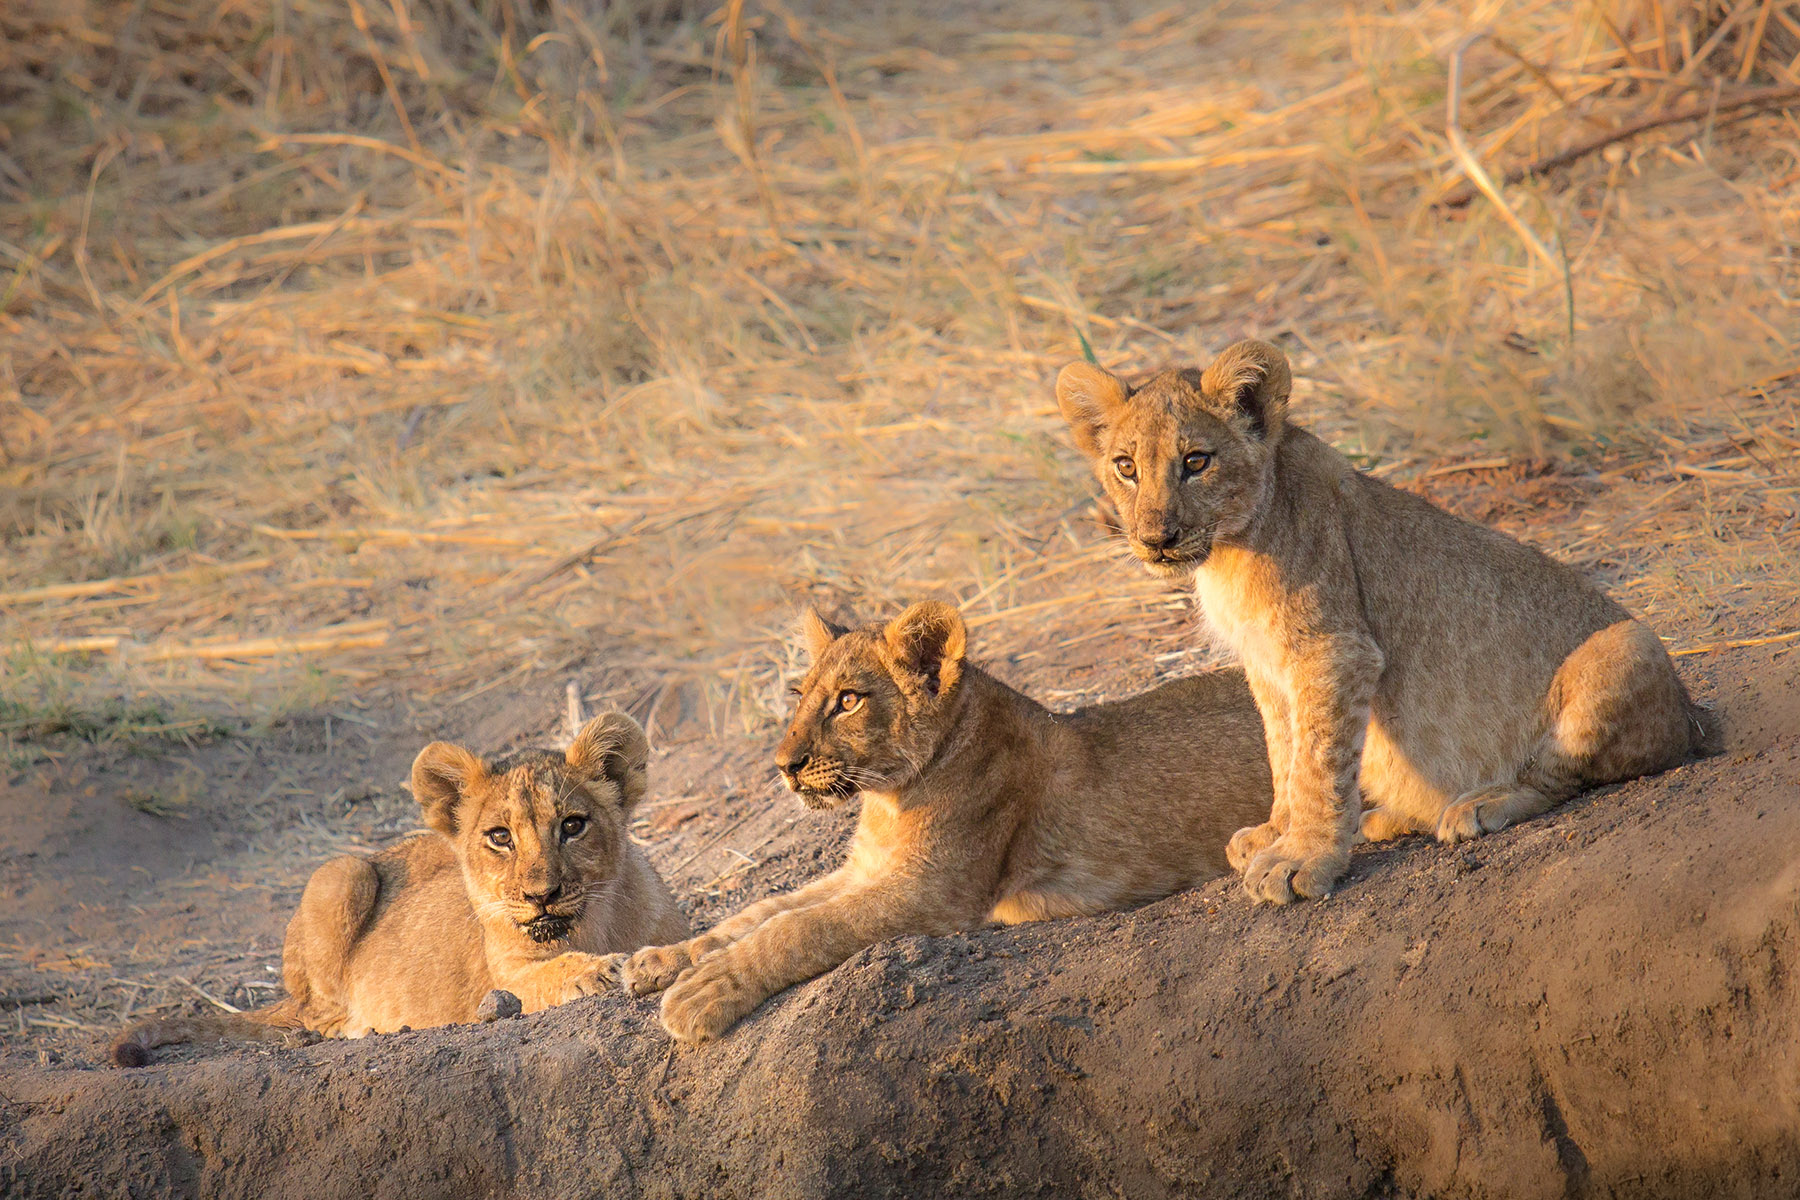 Lion cubs in morning light. Ruaha National Park, Tanzania - 20/SEP/2016